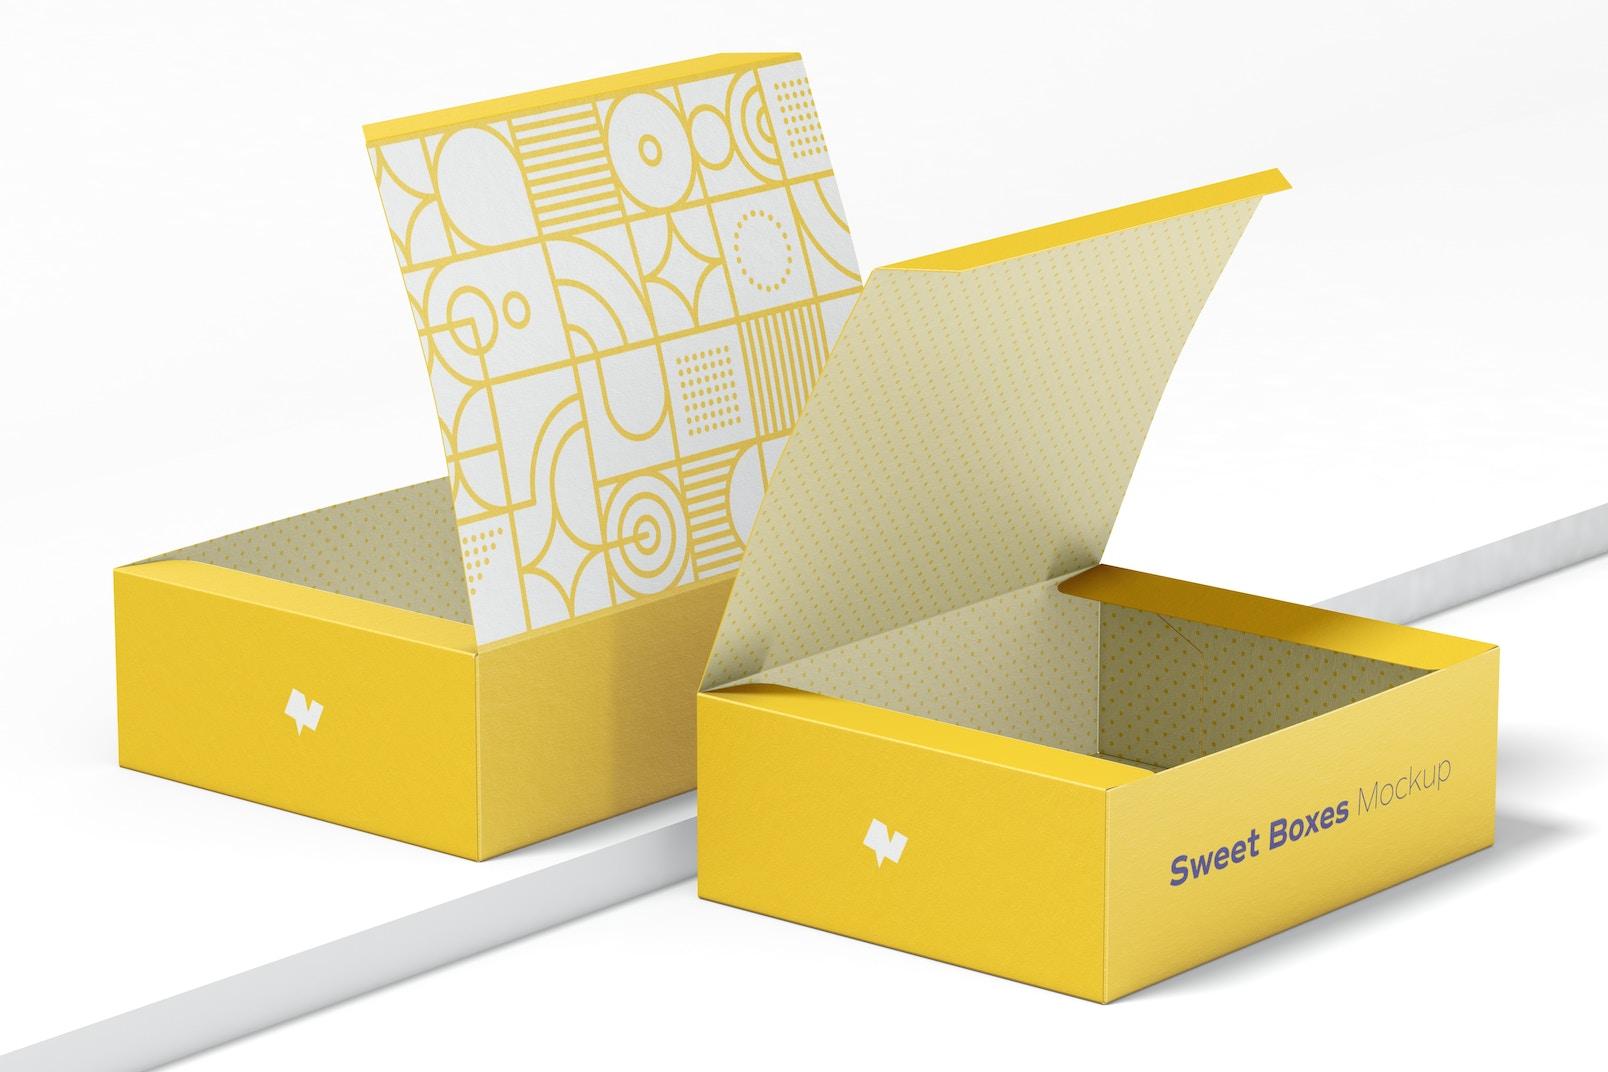 Sweet Boxes Mockup